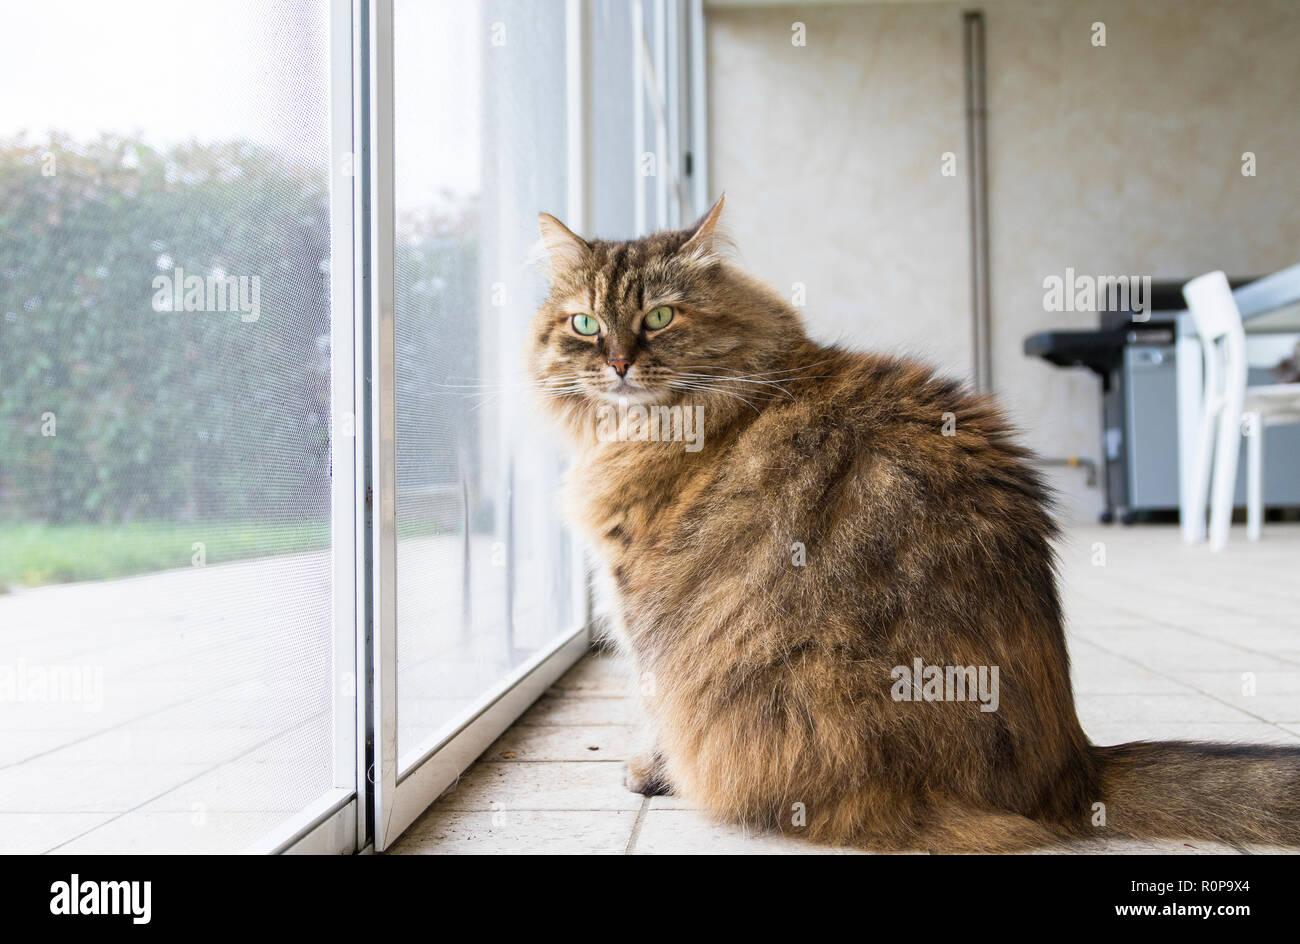 Tabby livestock cat at the window, curious pet - Stock Image